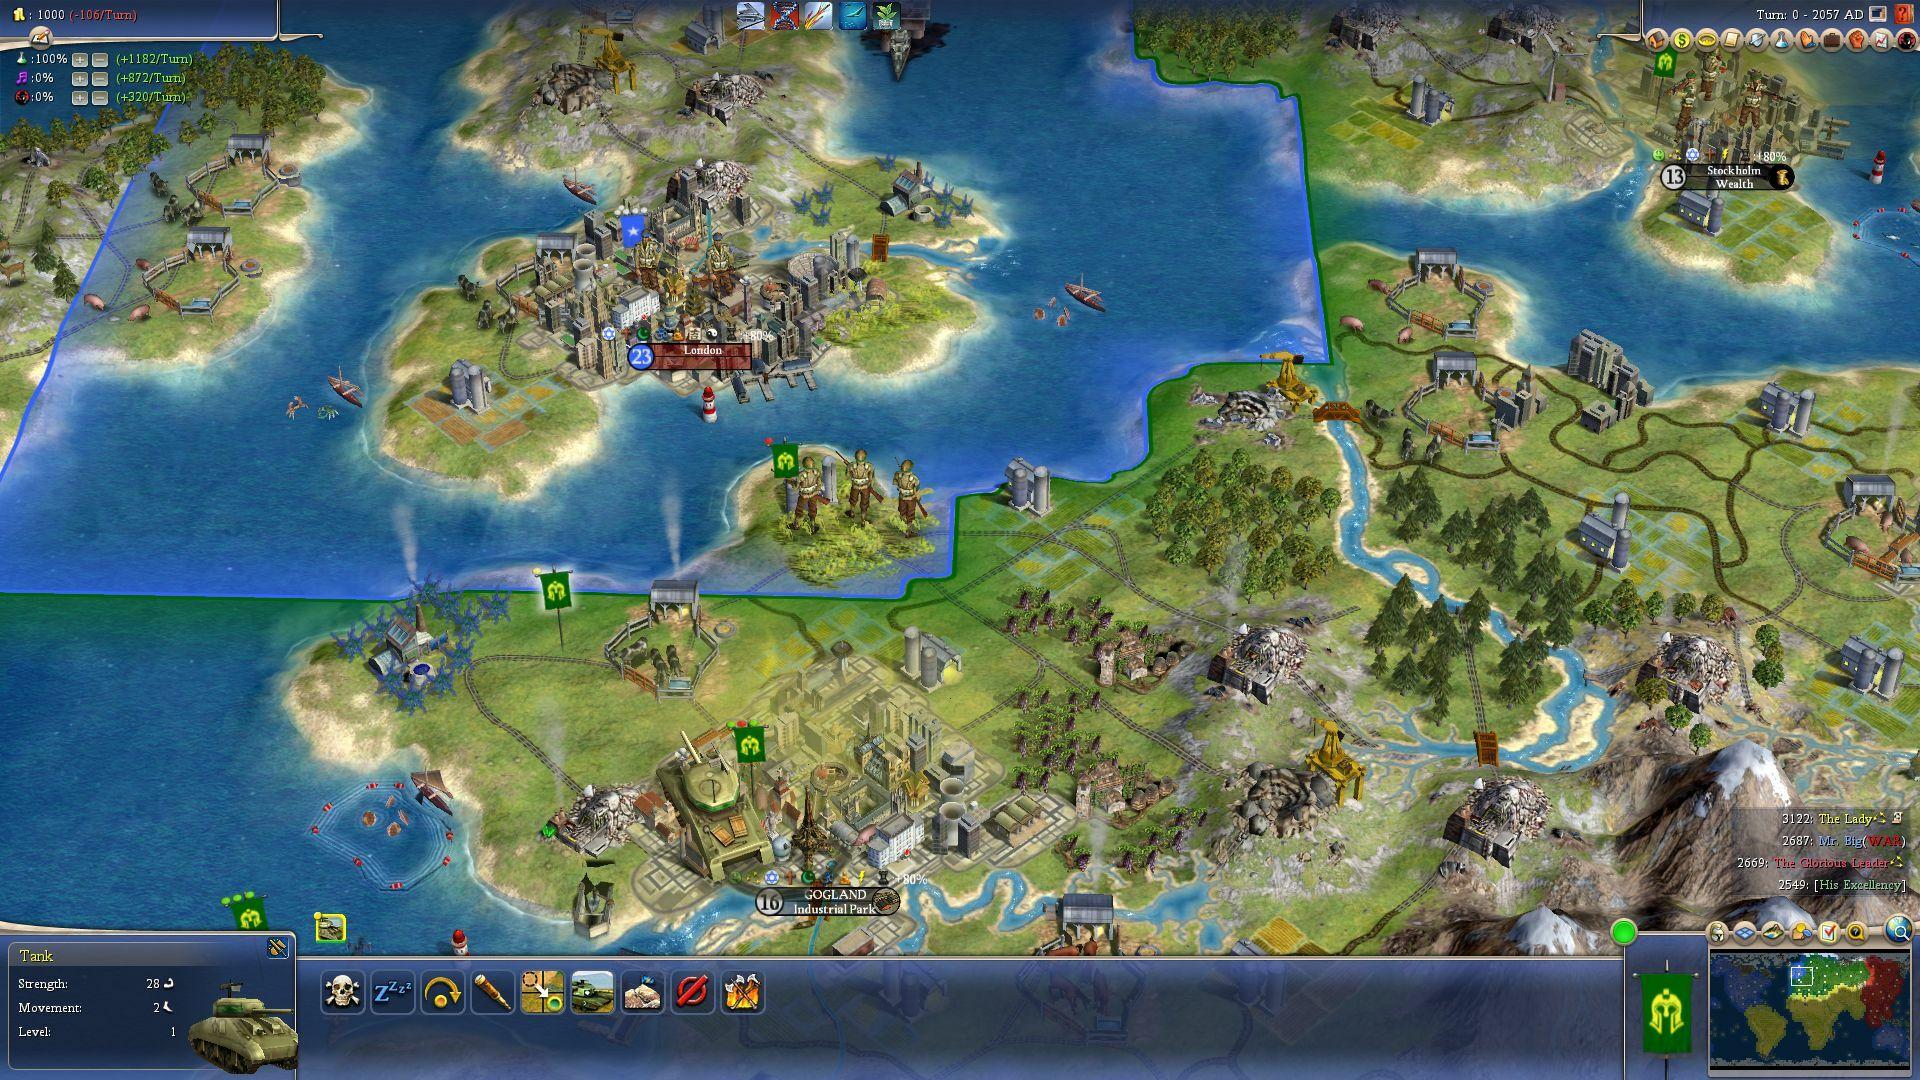 civilization-iv-complete-edition-pc-screenshot-04